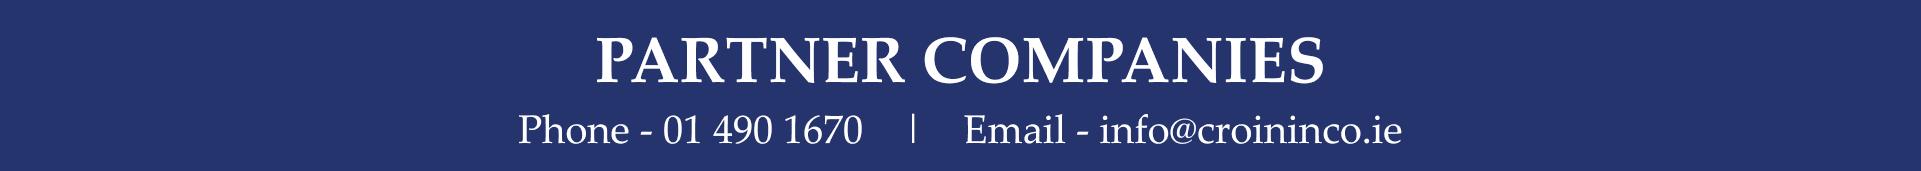 Cronin. Our partner companies